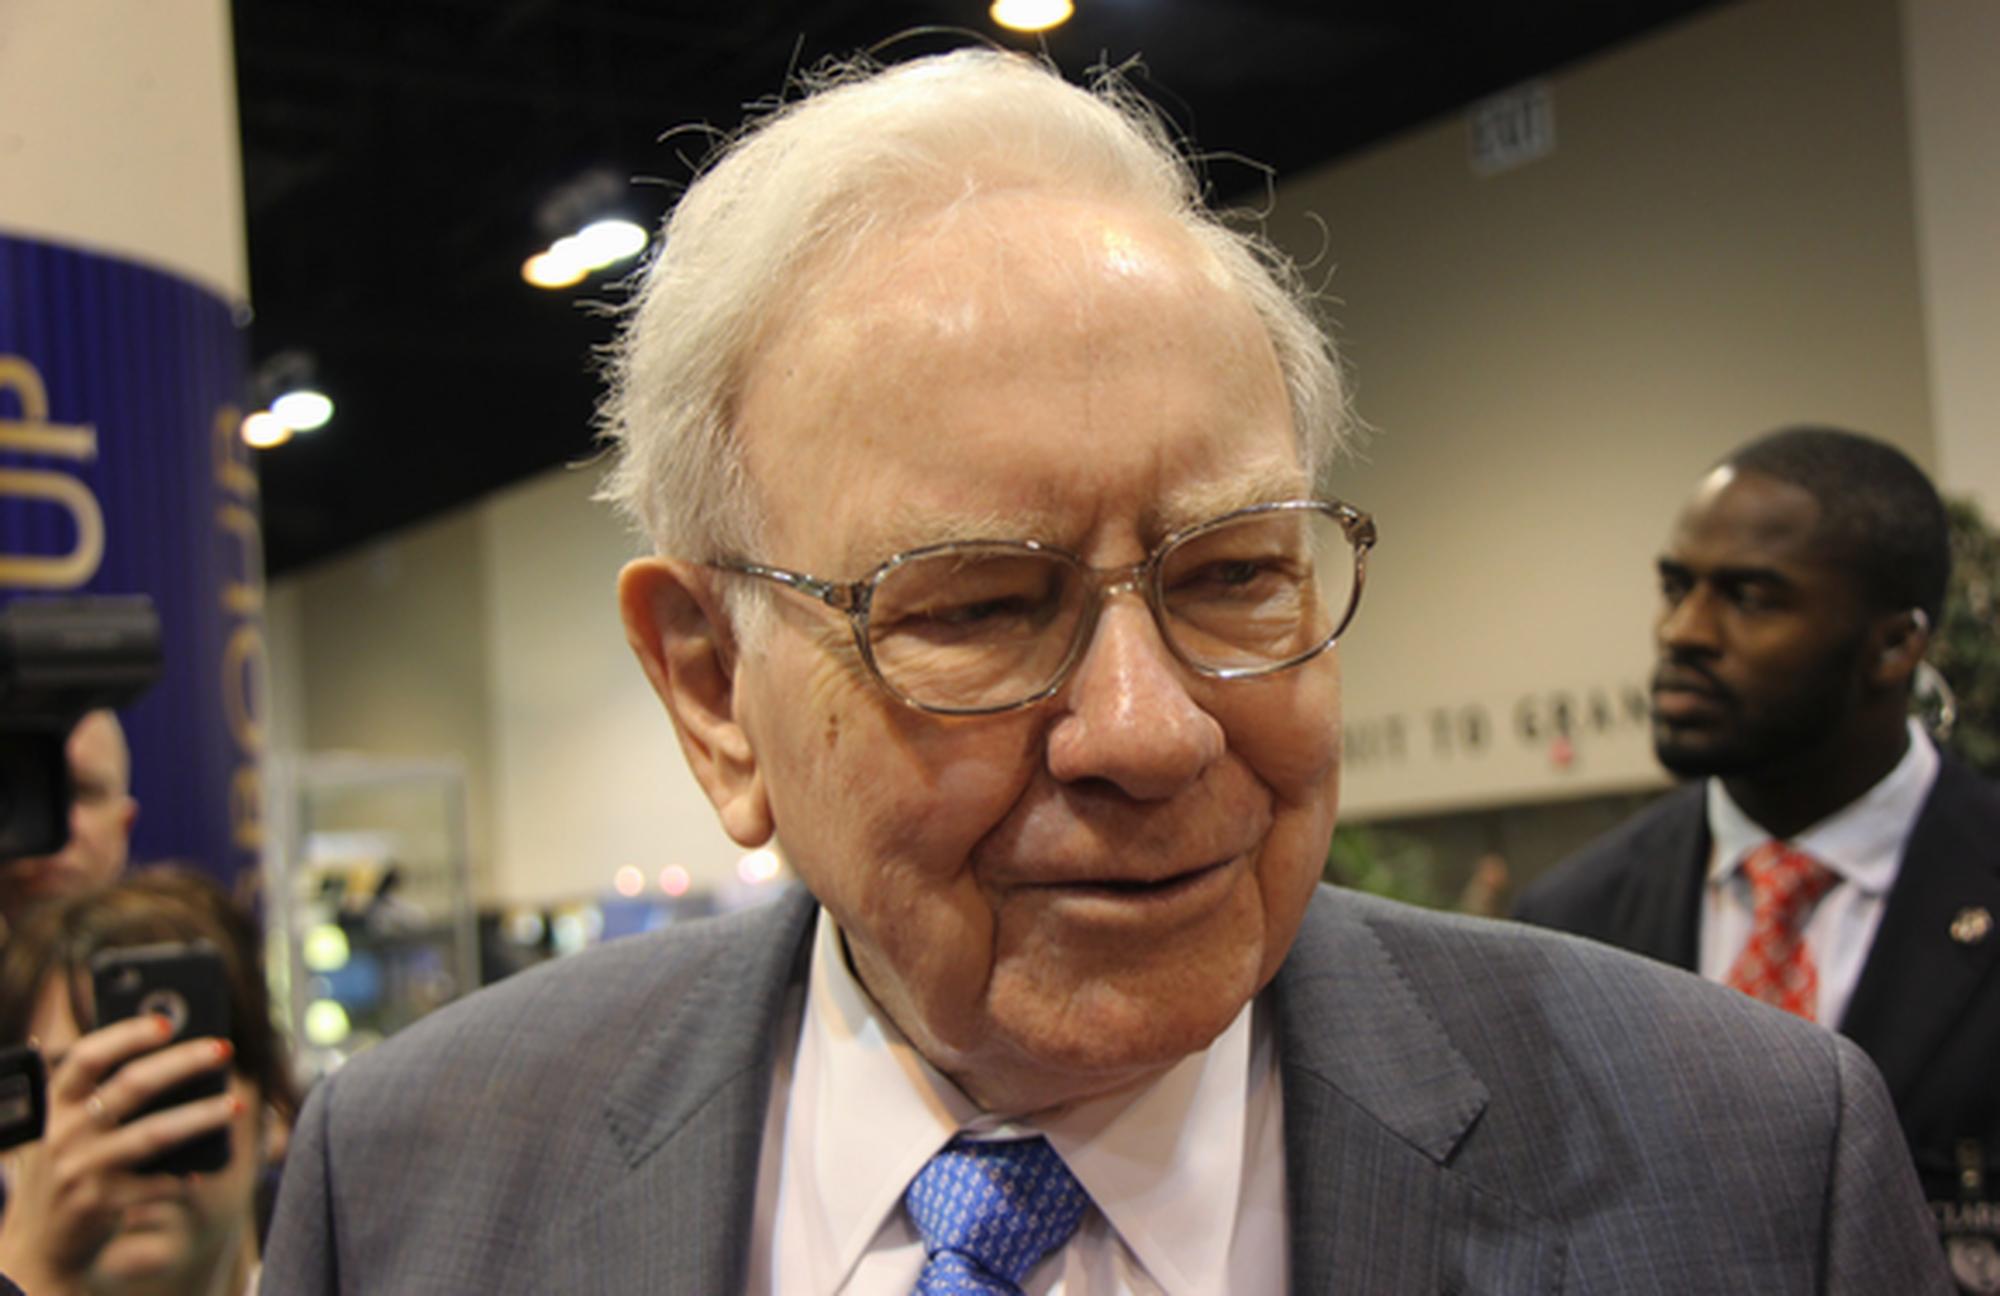 Why Doesn't Warren Buffett Own Any Renewable Energy Stocks?  image